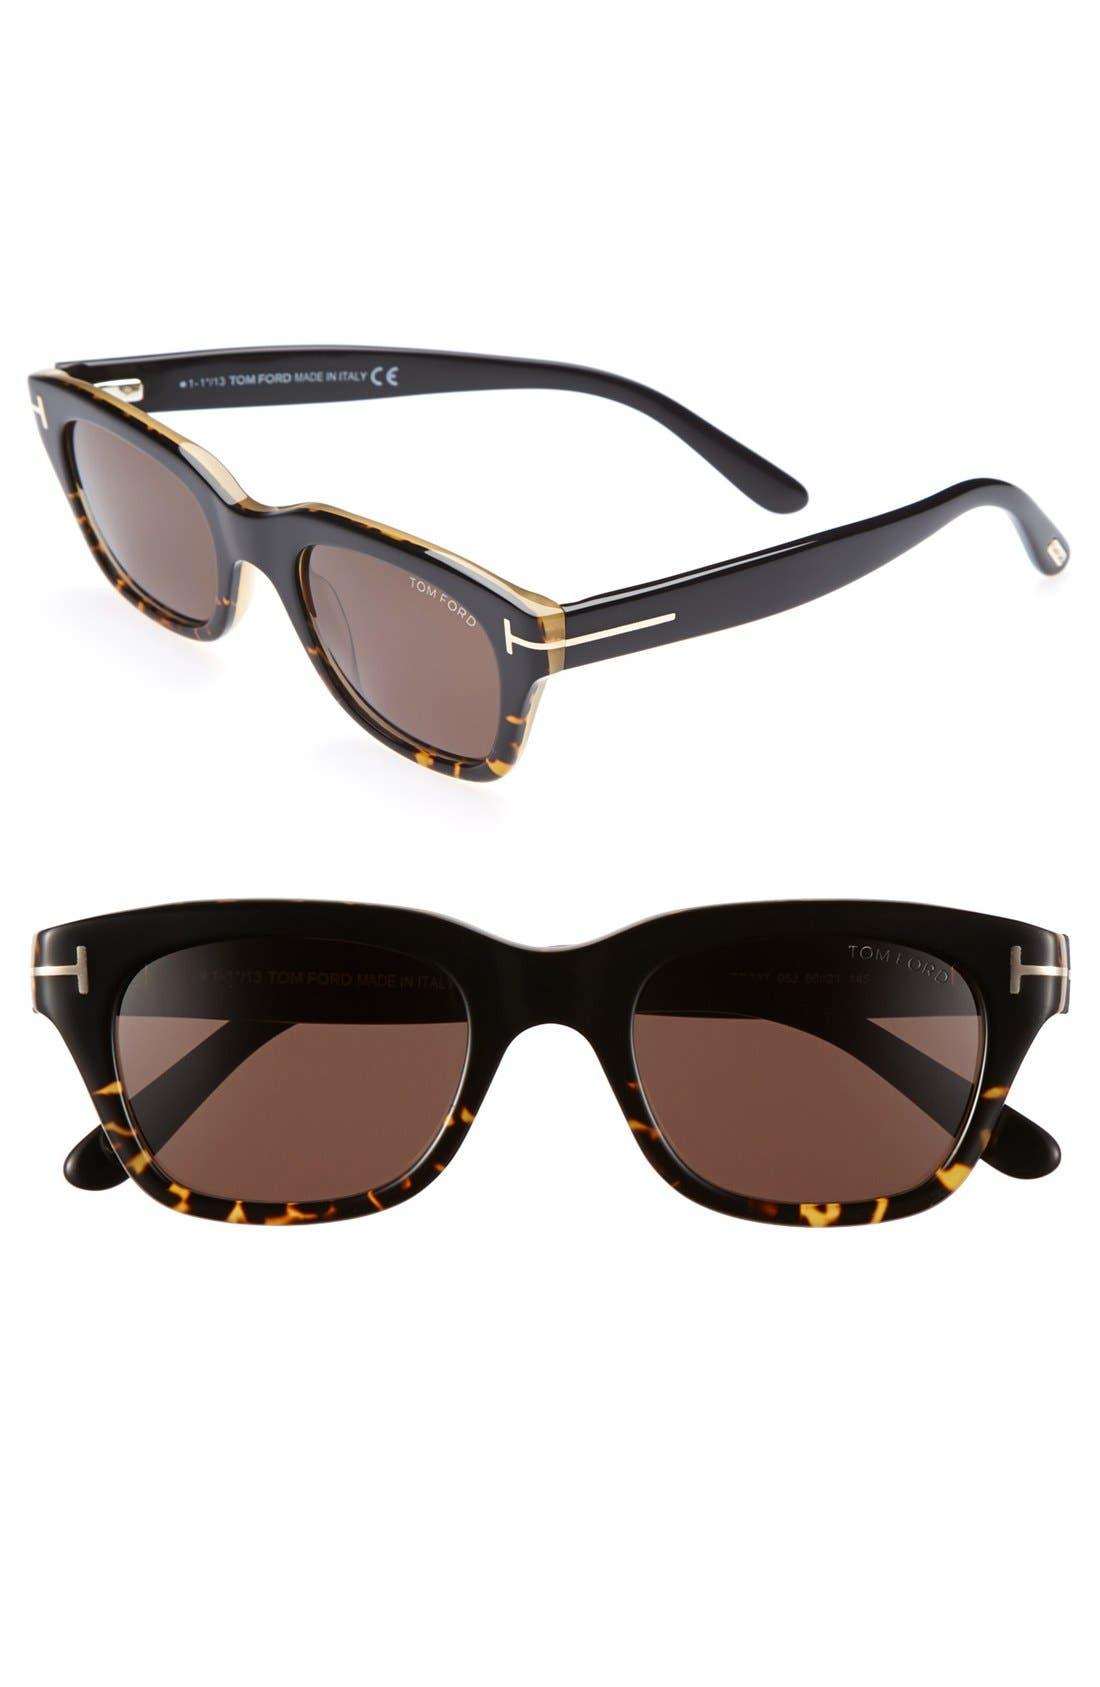 Main Image - Tom Ford 'Snowdon' 50mm Sunglasses